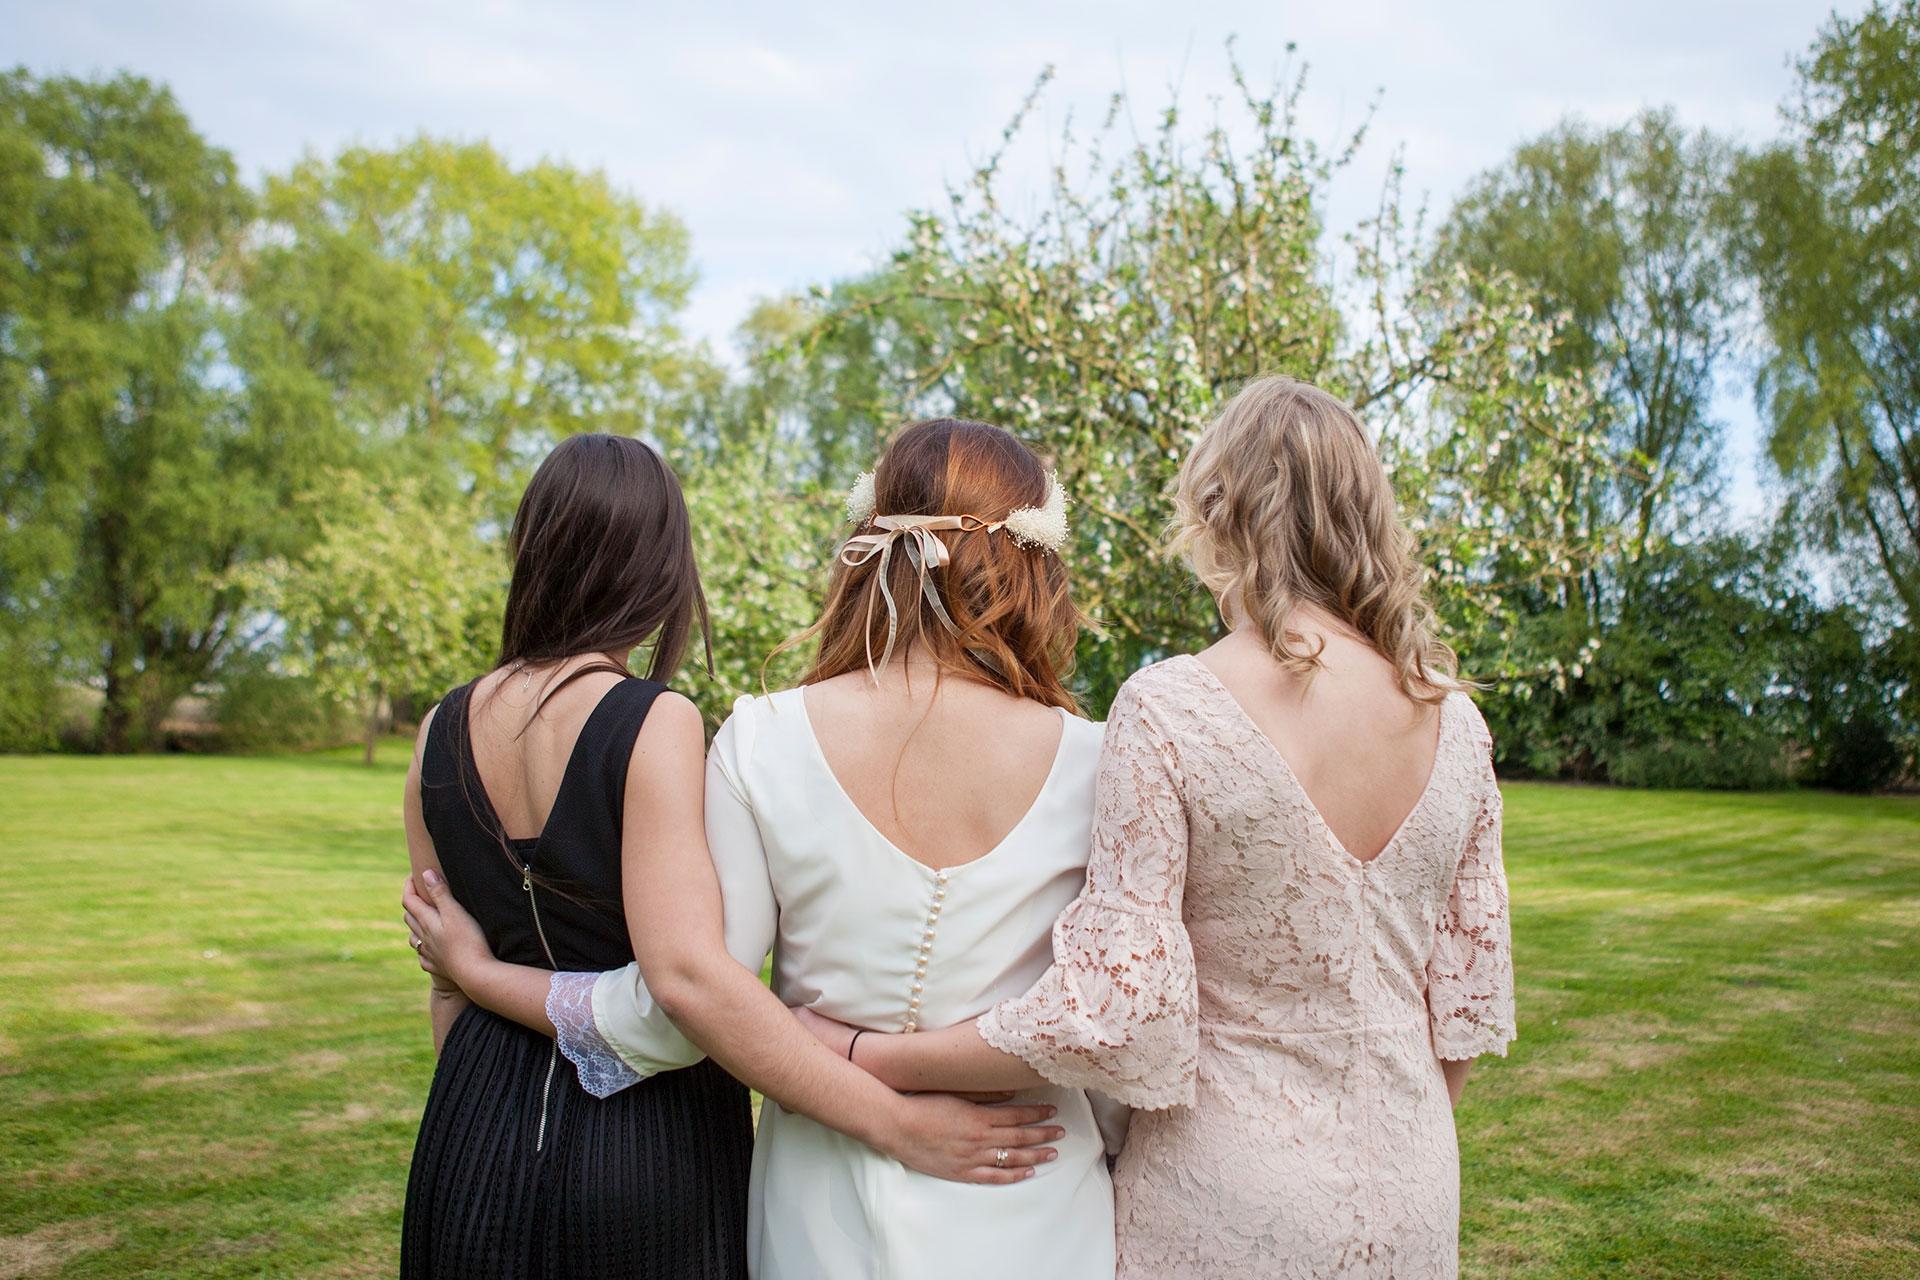 particuliers-evenements-mariages-oui-zelie&valentin-56